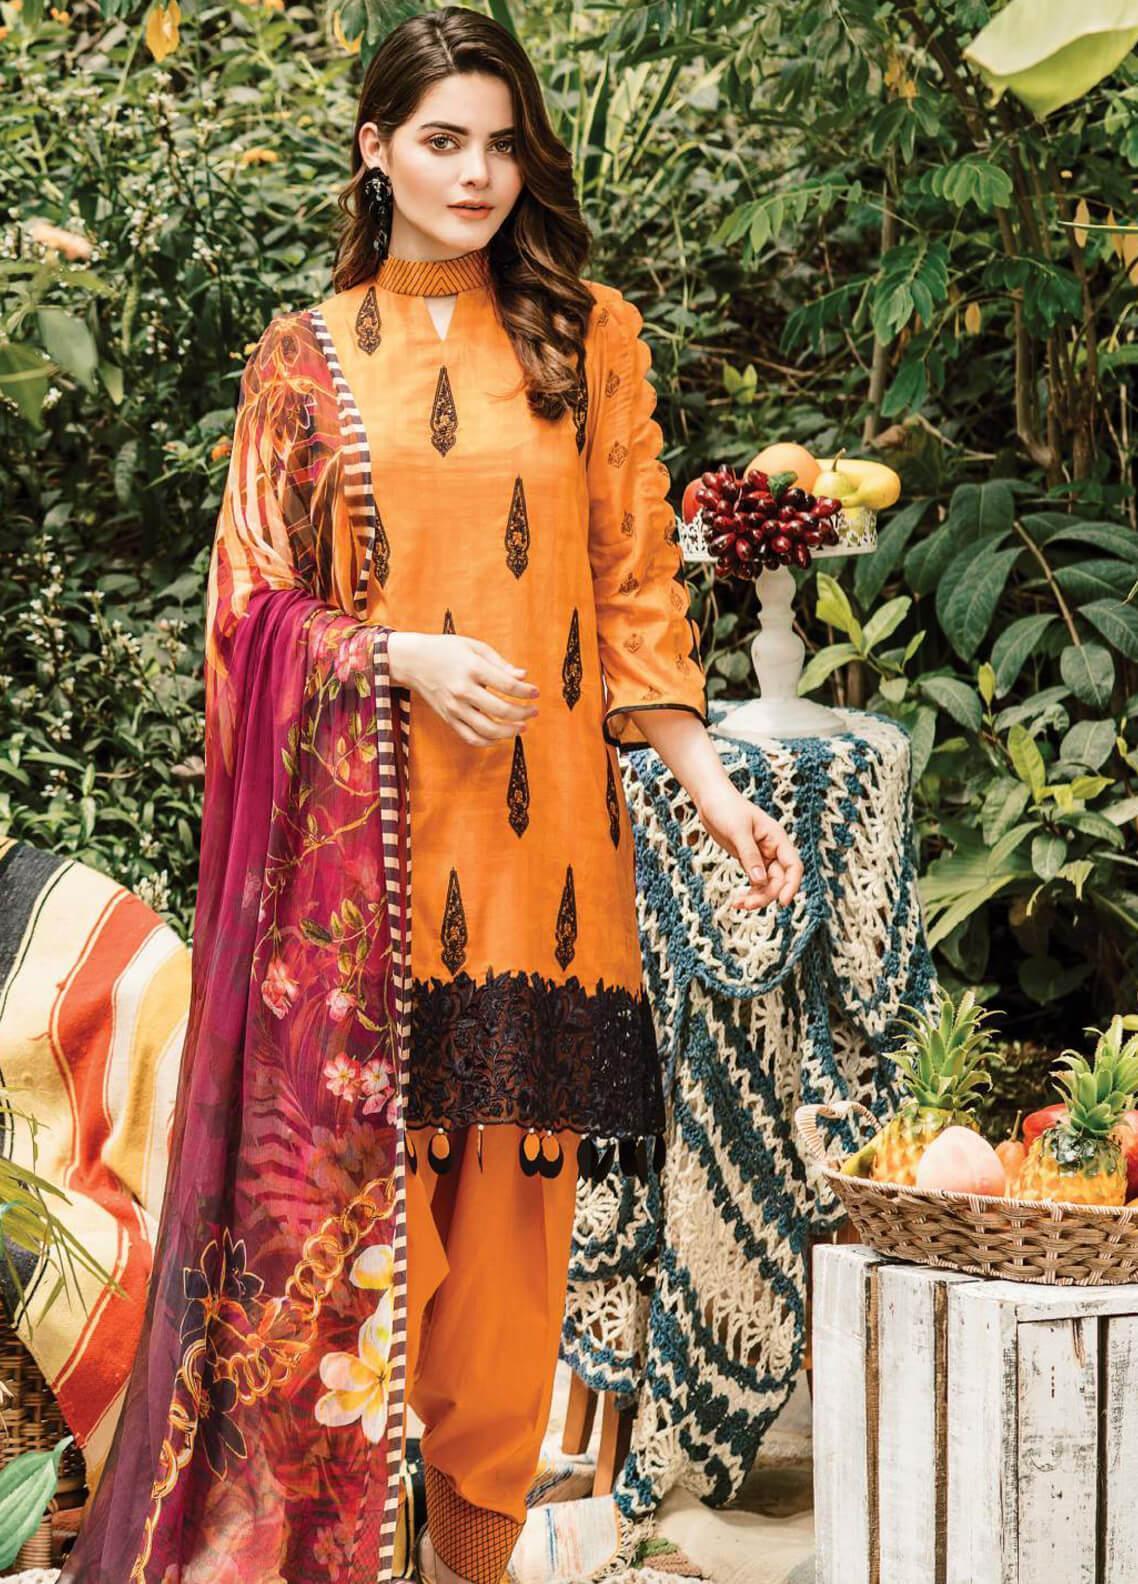 Serene Premium Embroidered Lawn Unstitched 3 Piece Suit SPM19L 18 TIGRESS PRIDE - Spring / Summer Collection